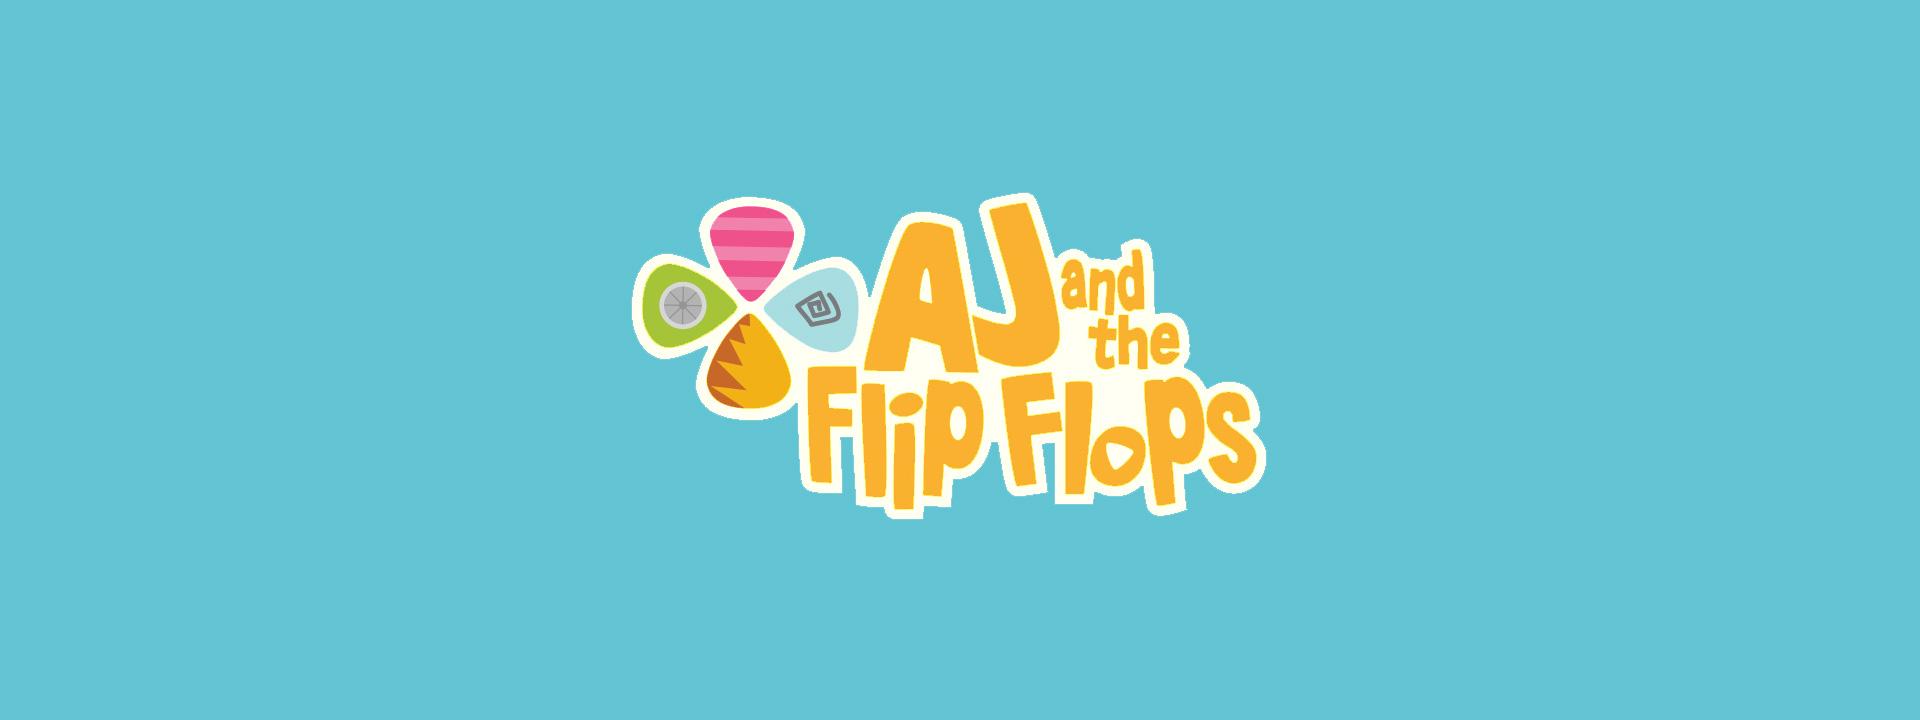 aj flip flops brand development illustration mobile apps production header